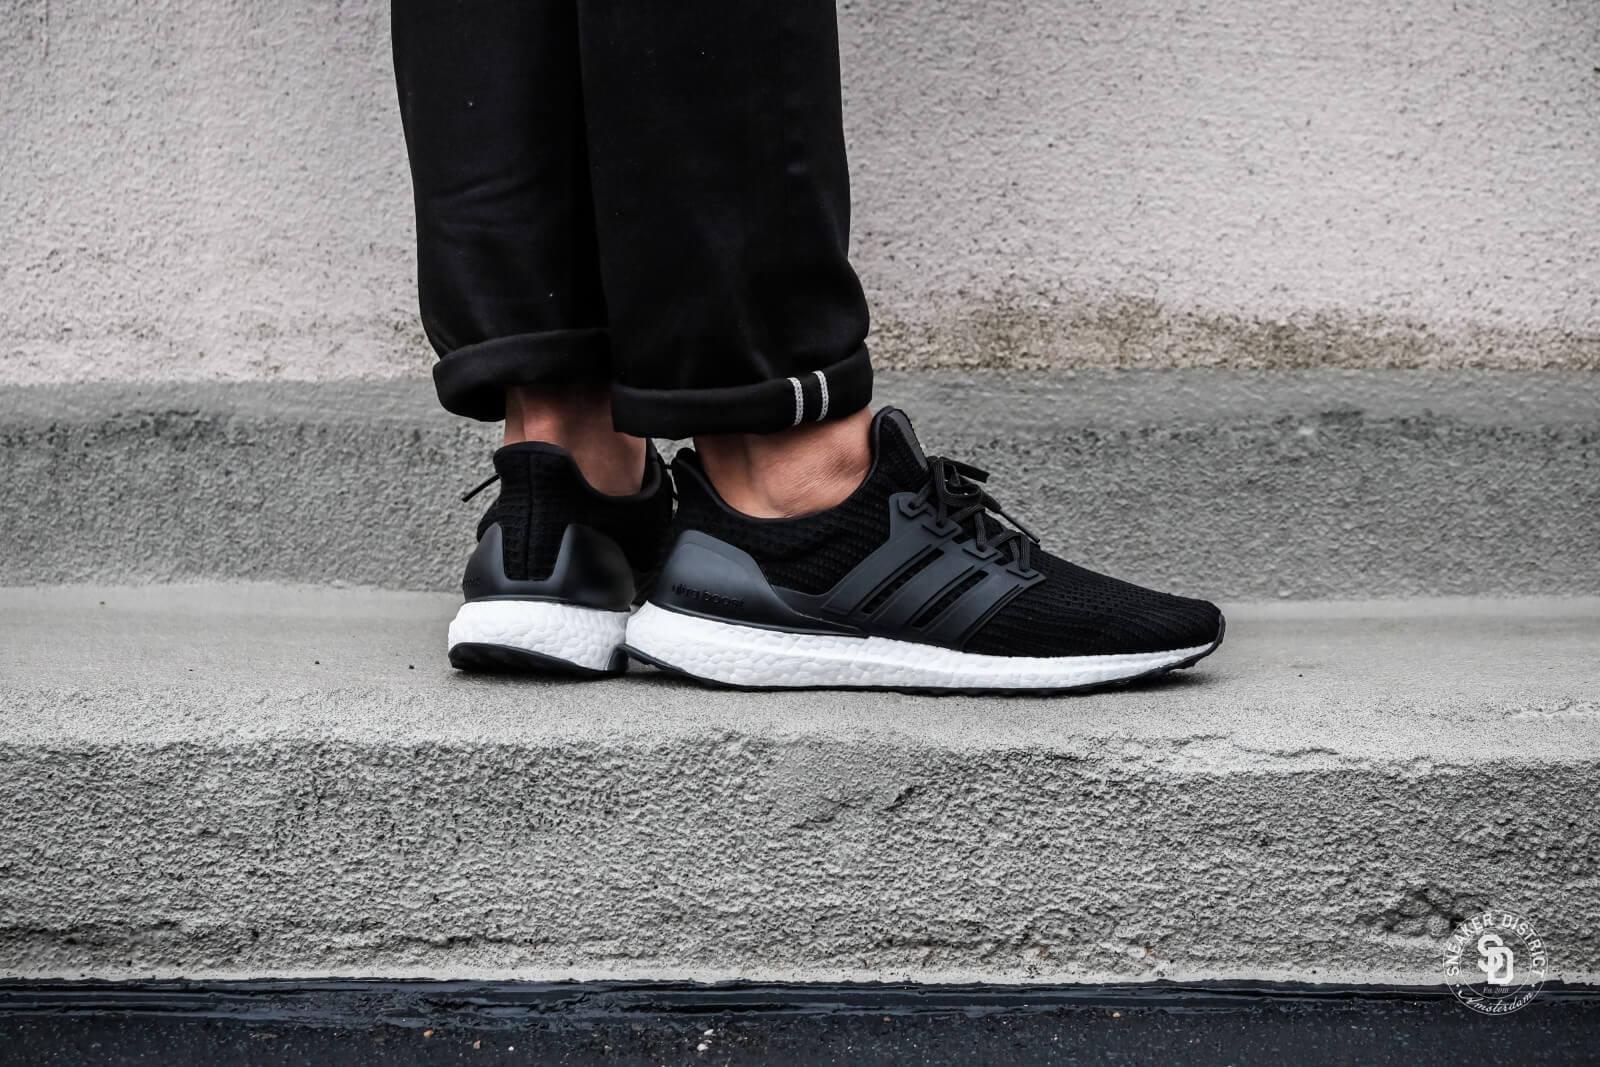 inundar episodio Porque  Adidas Nmd Cs1 City Sock Boost Primeknit Climacool | Portal for Tenders